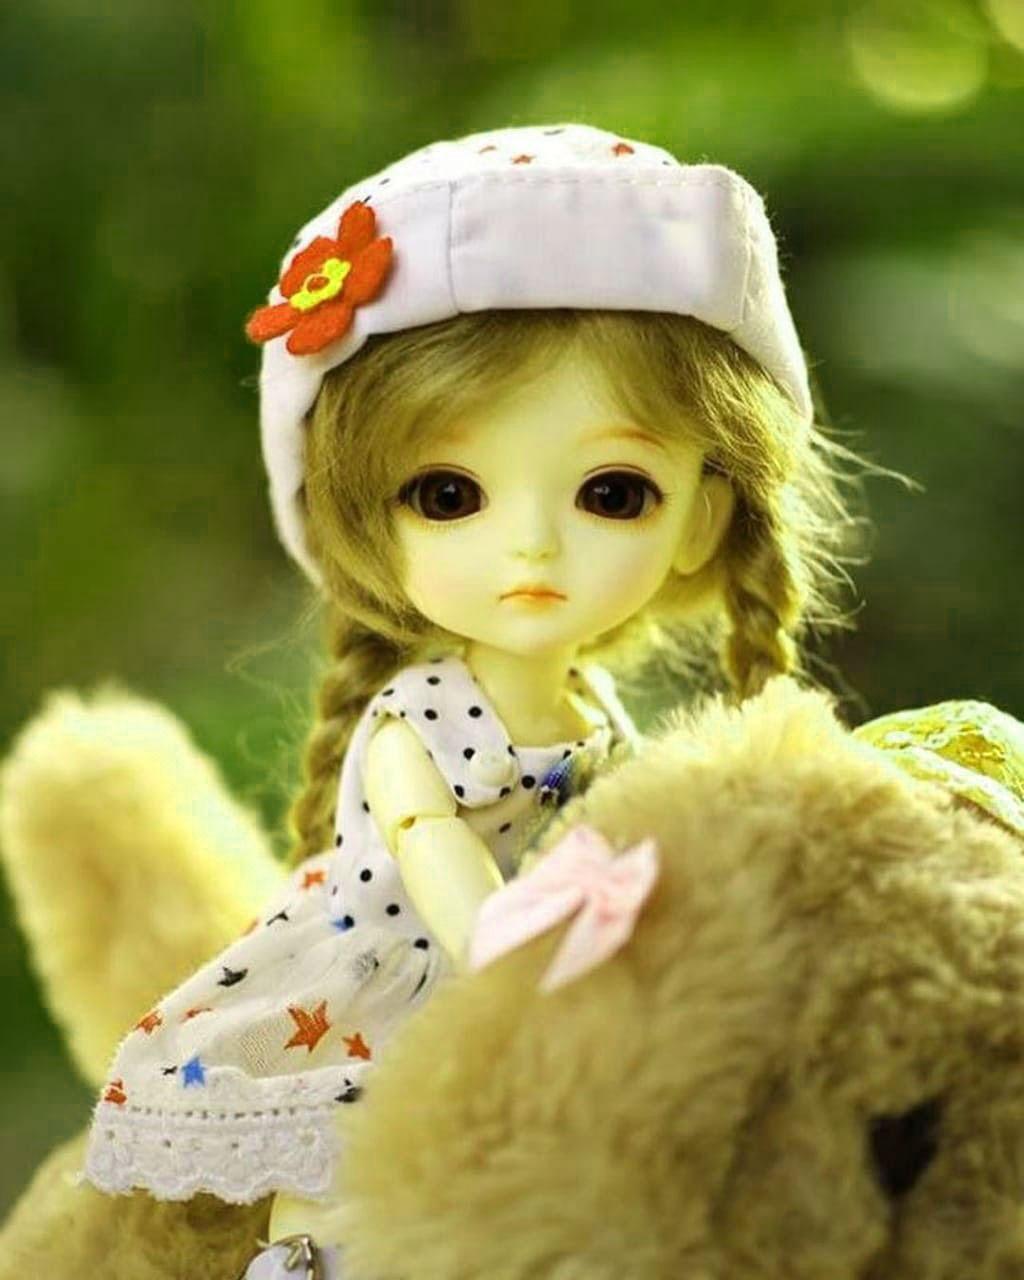 doll whatsapp dp Wallpaper HD